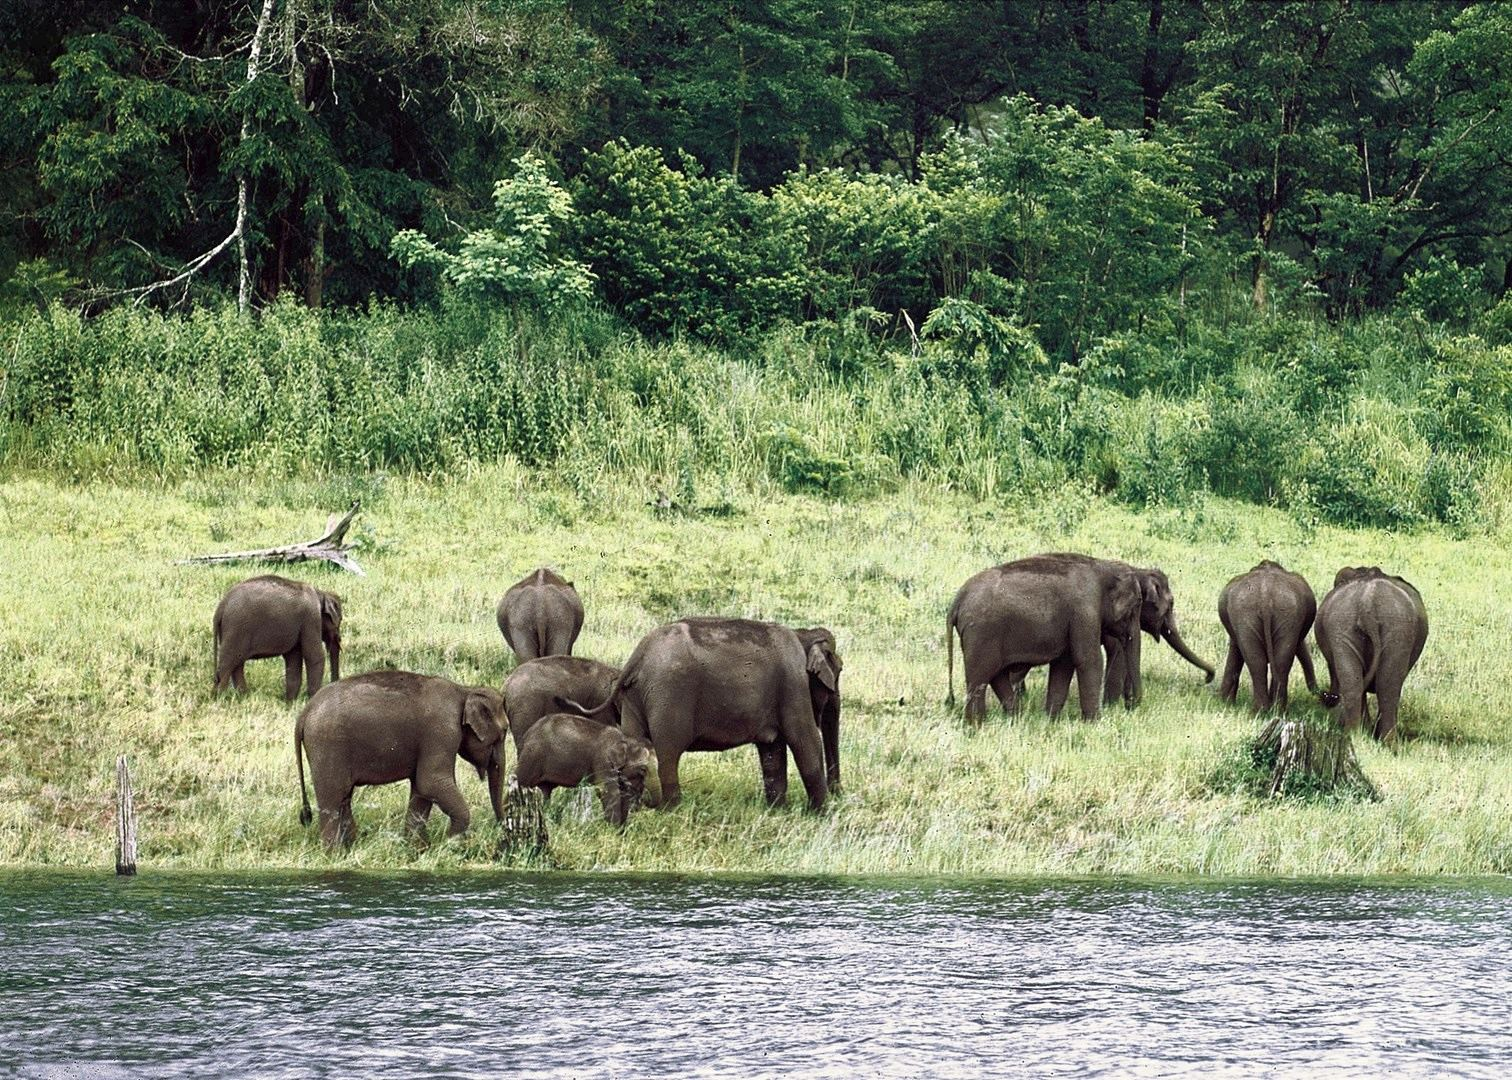 Visit Nagarhole National Park in India | Audley Travel